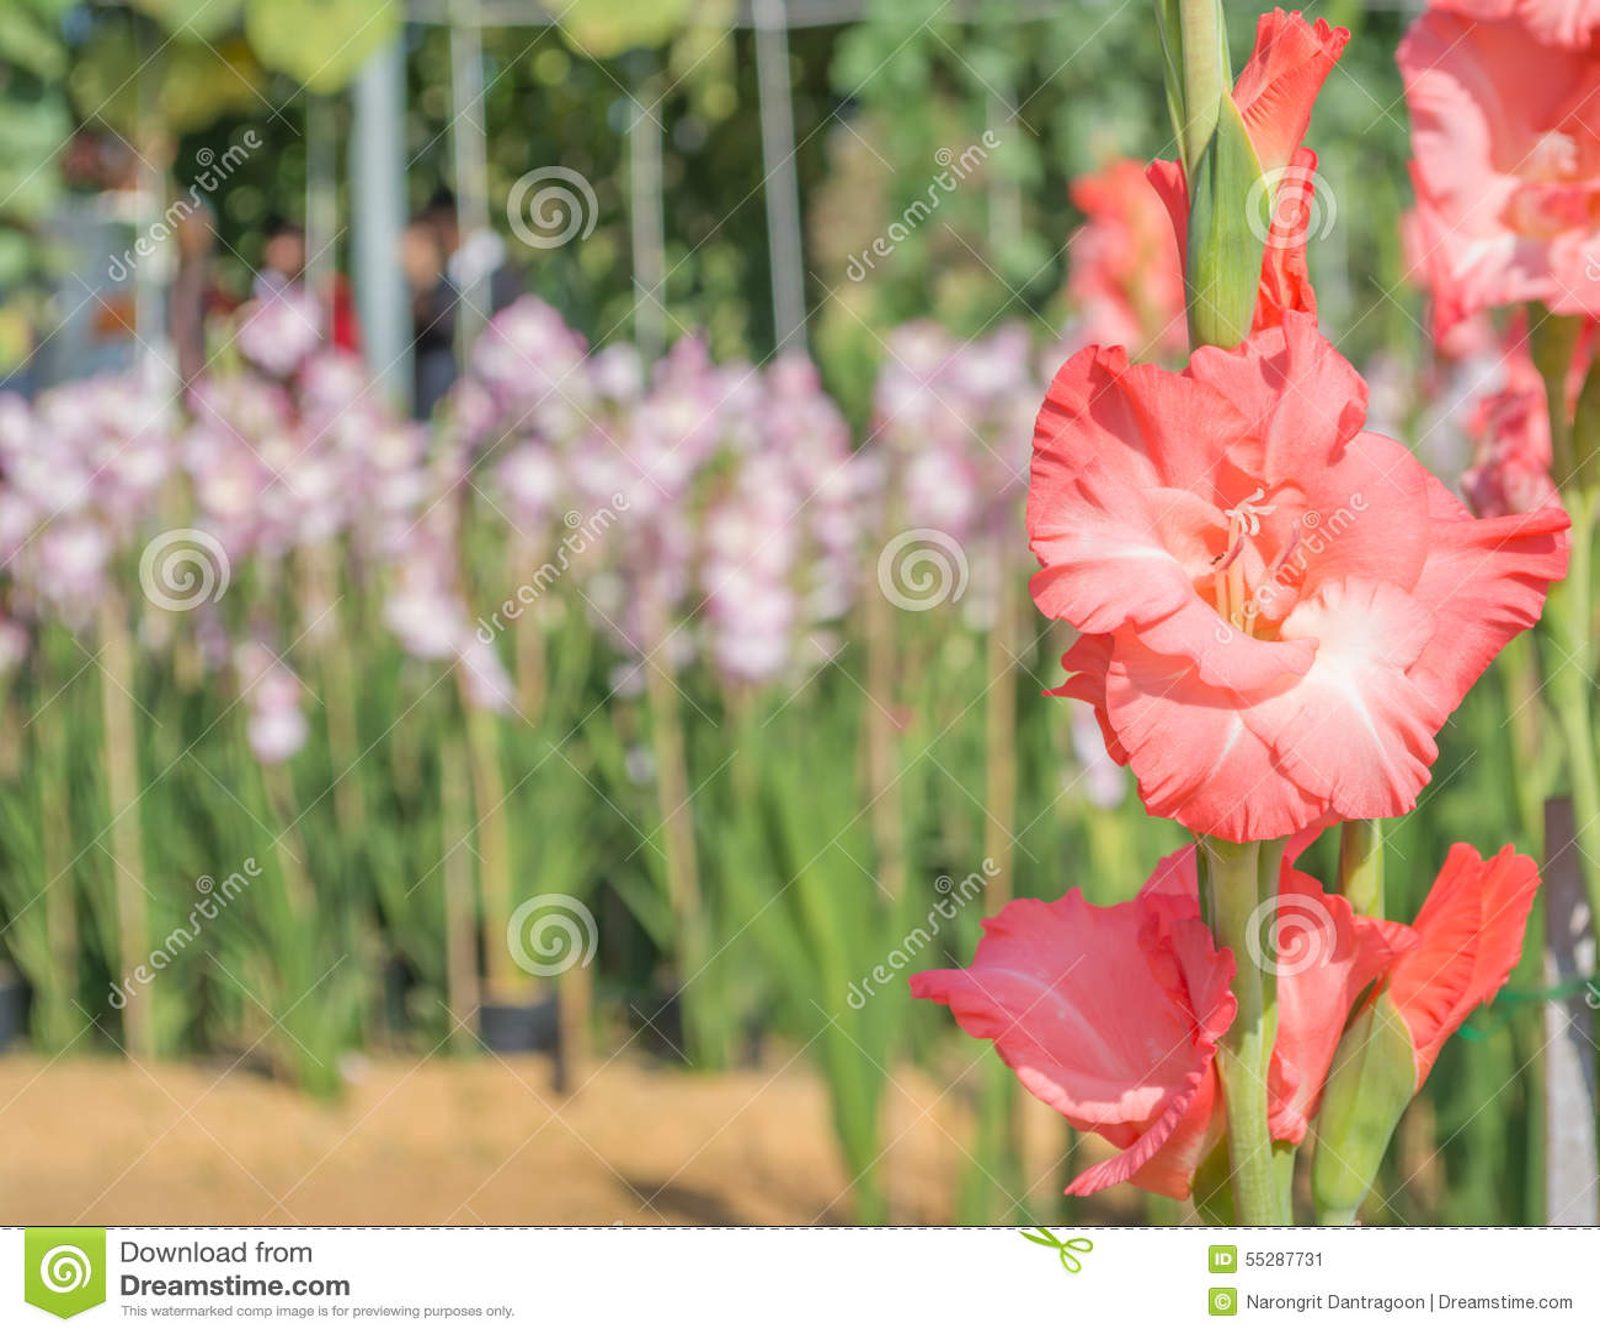 Group Of Gladiolus Flower Stock Image Image Of Blossom 55287731